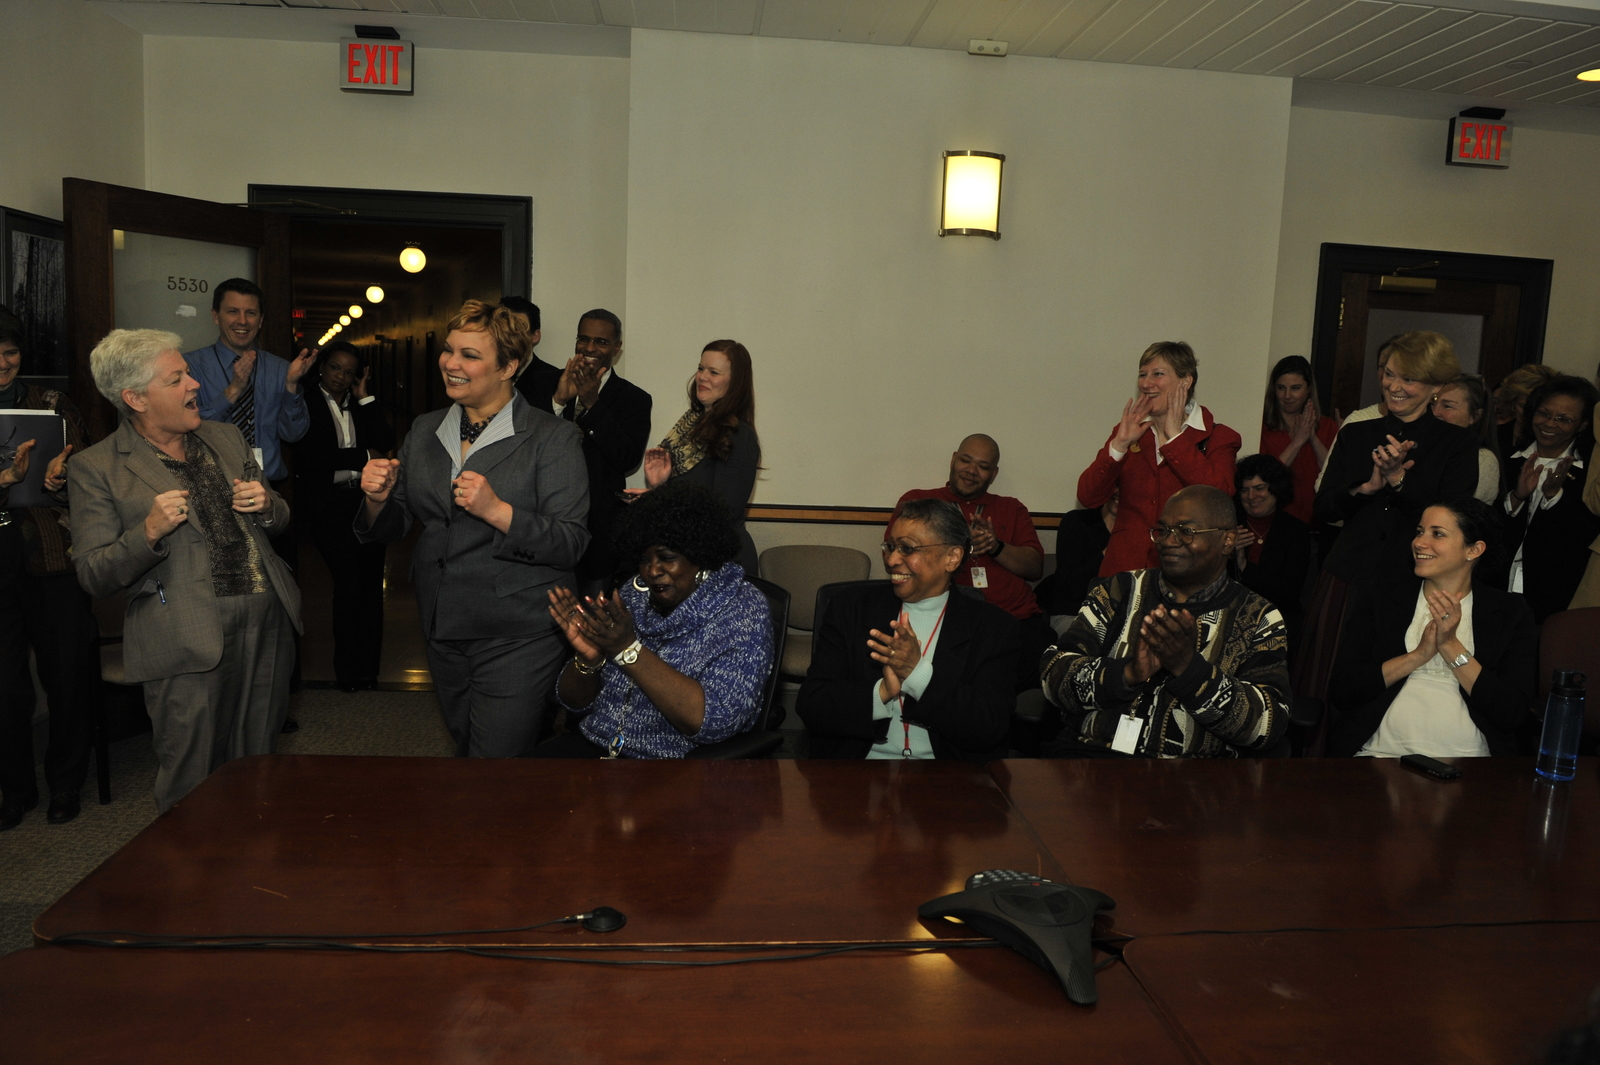 Office of the Administrator - Lisa Jackson's Farewell Tour [412-APD-1115-2013-02-07_FarewellTour_149.JPG]